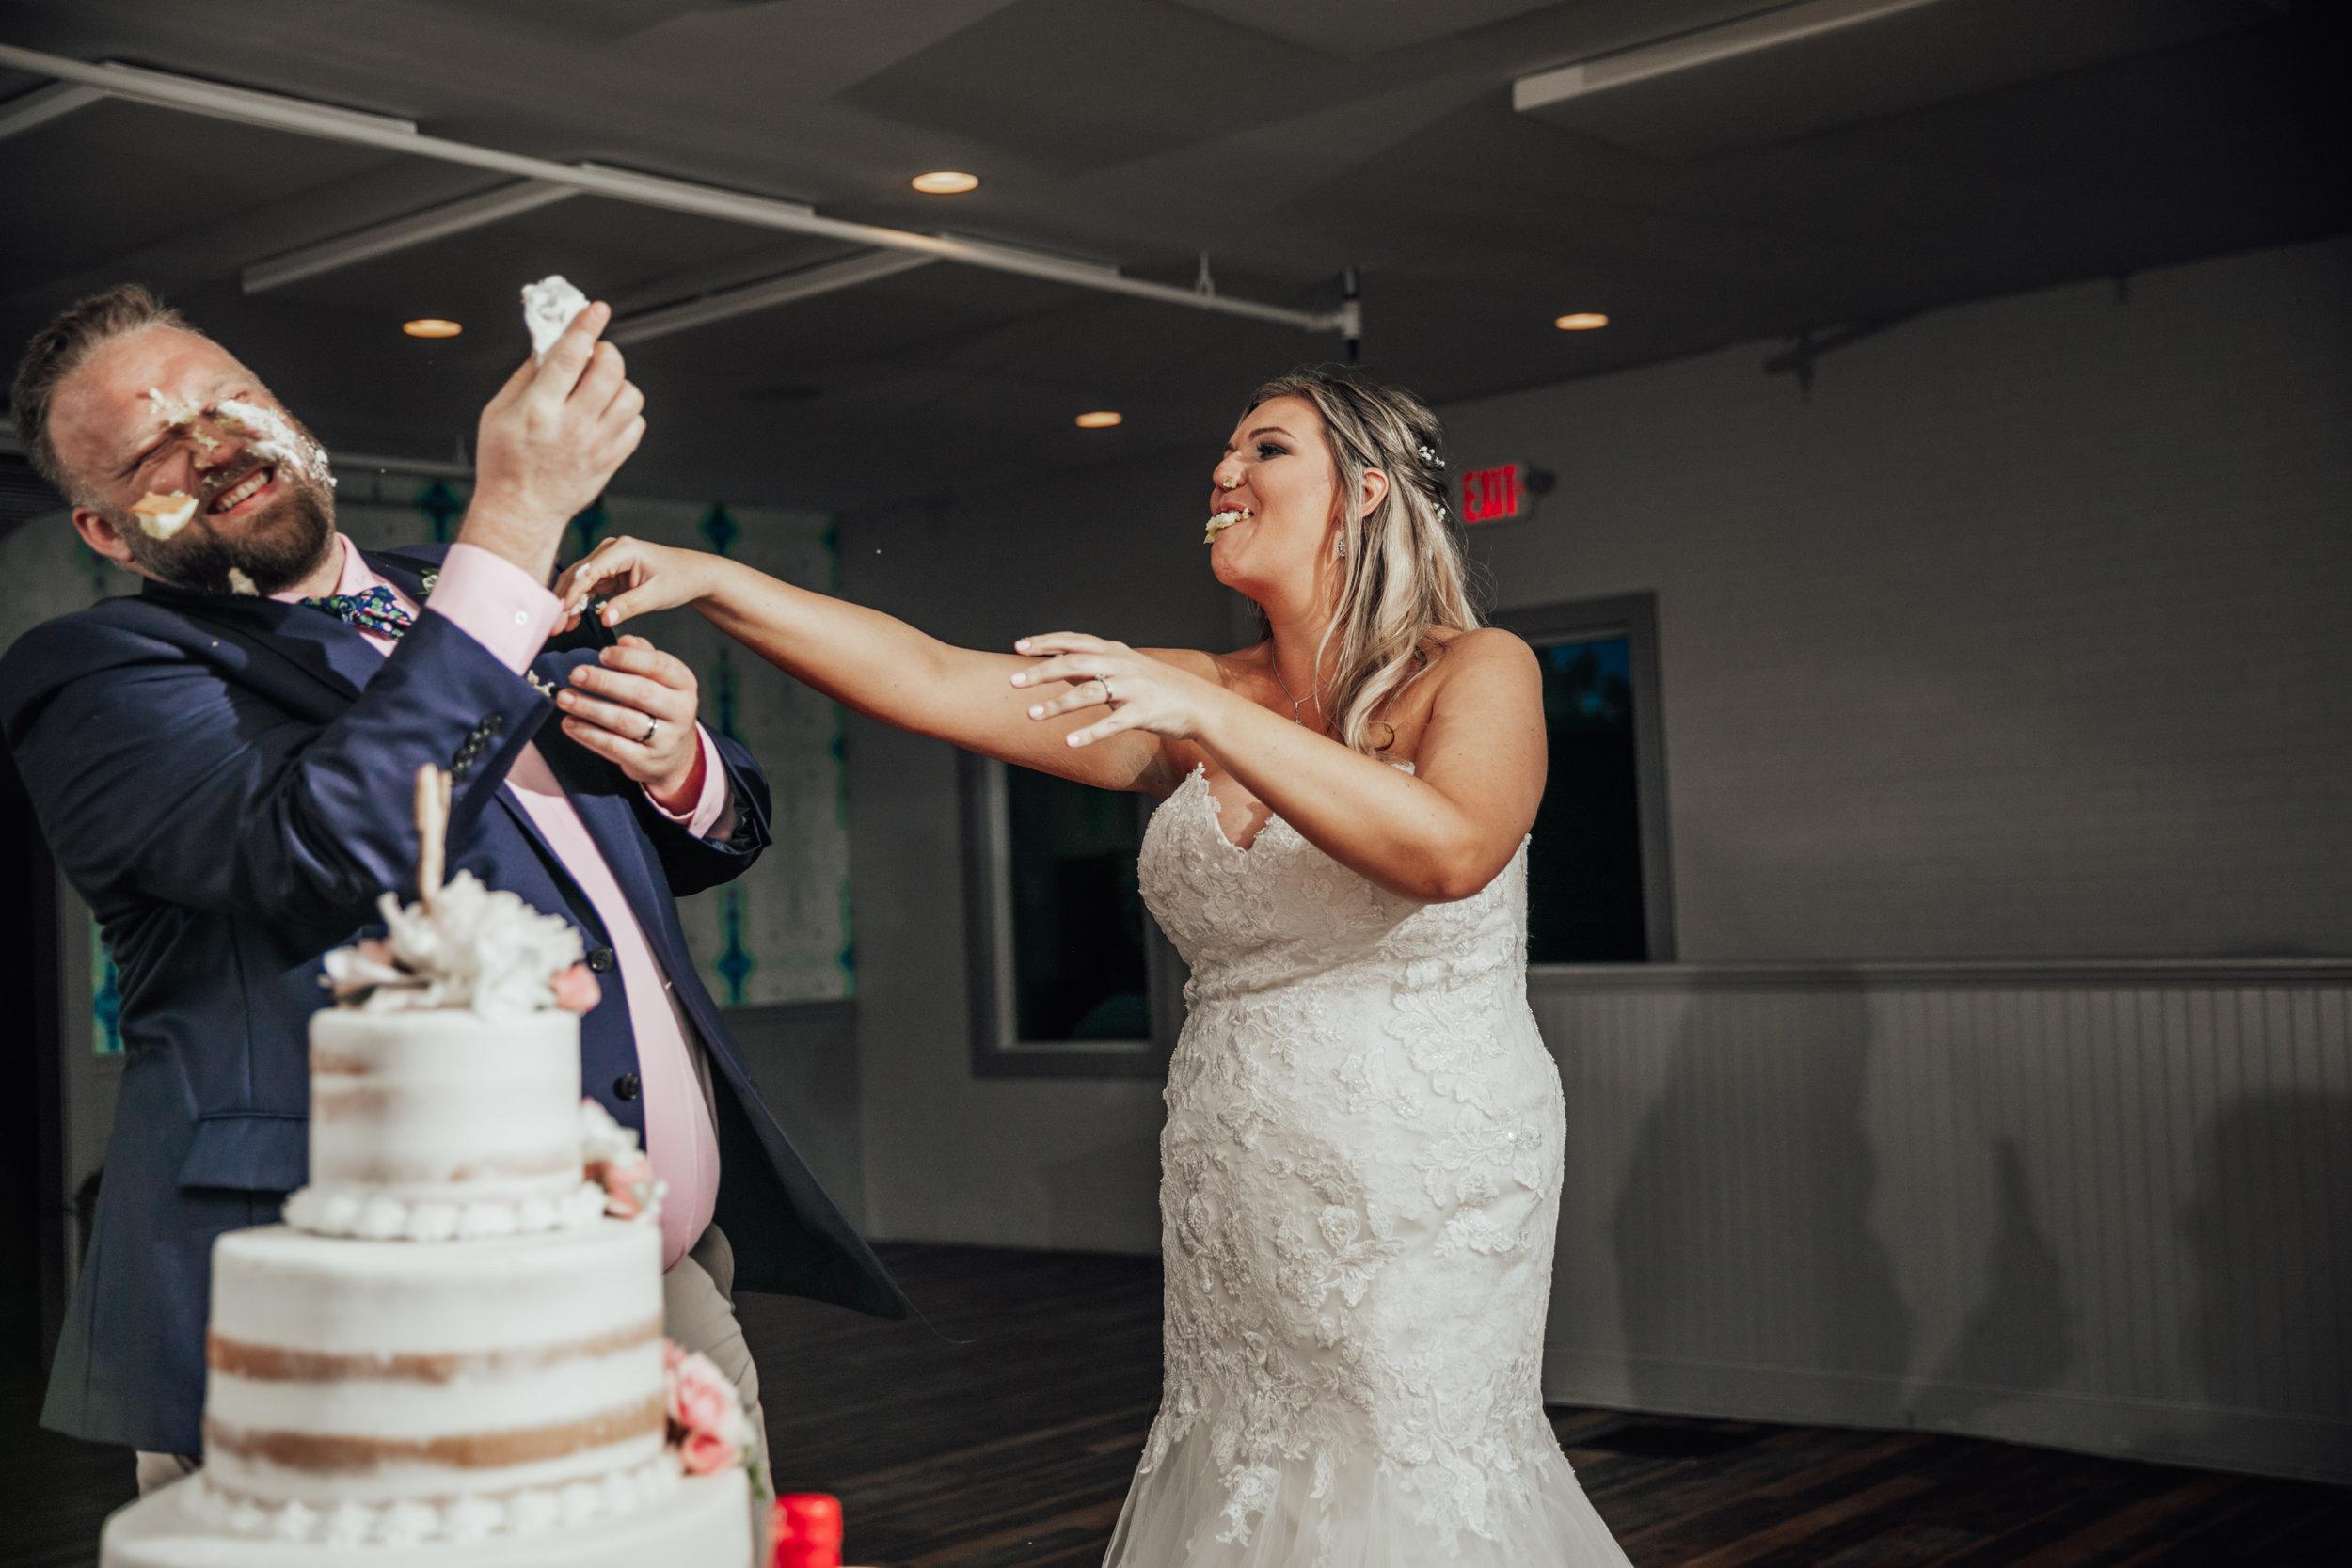 New Jersey Wedding Photographer, Felsberg Photography LBI wedding photography 122.jpg